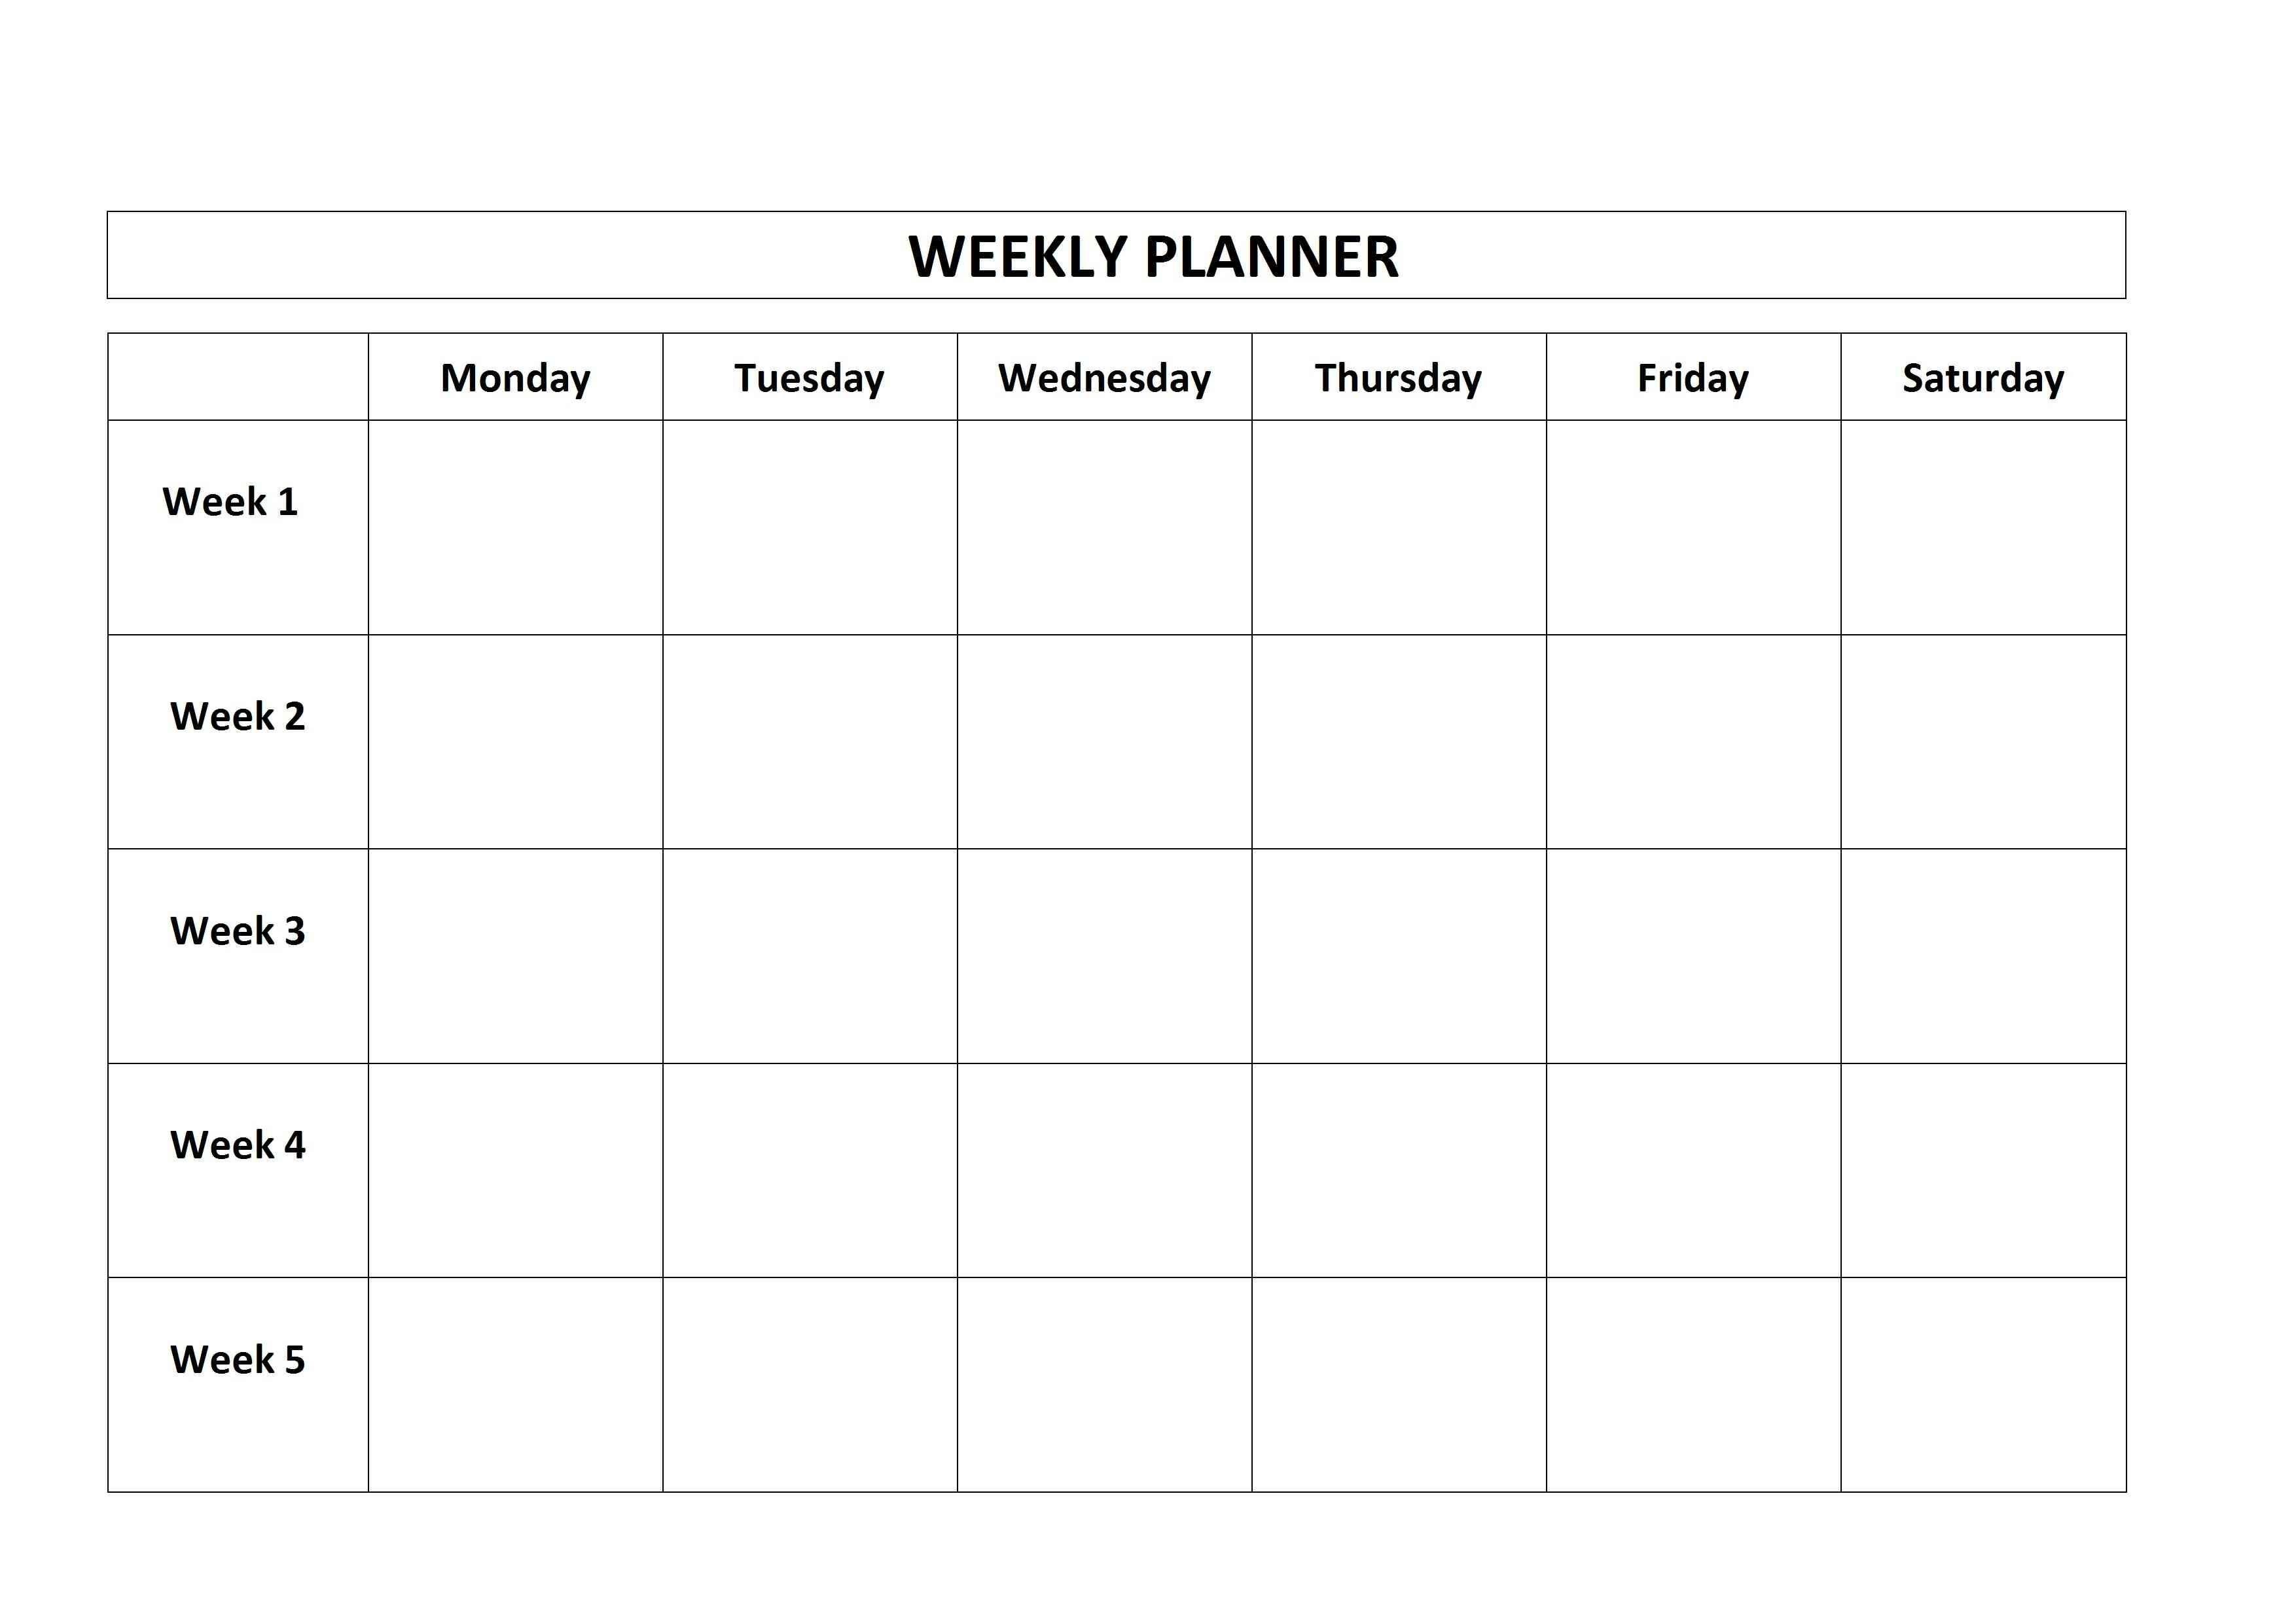 Free Printable Weekly Planner Monday Friday School Calendar Saturday To Friday Weekly Calendar